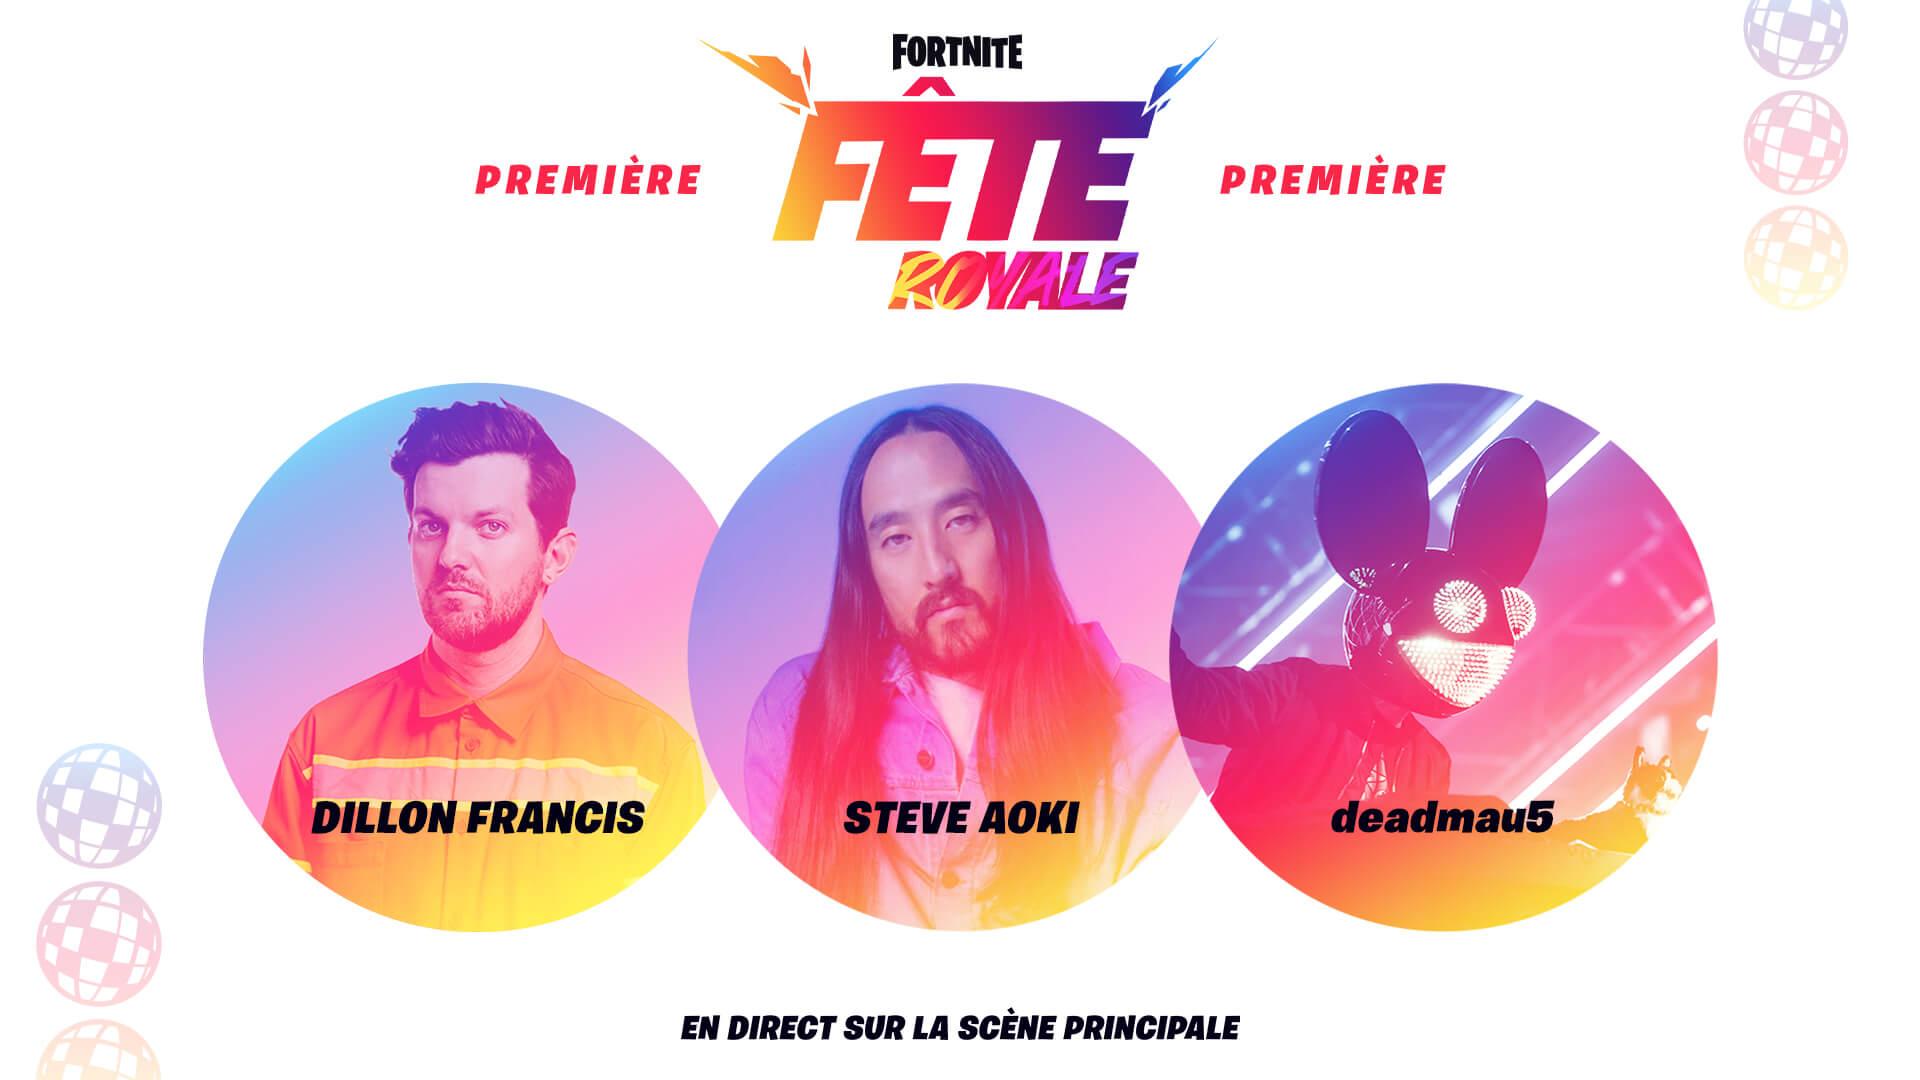 FR_12PR_Premiere_Reveal_deadmau5_Social.jpg